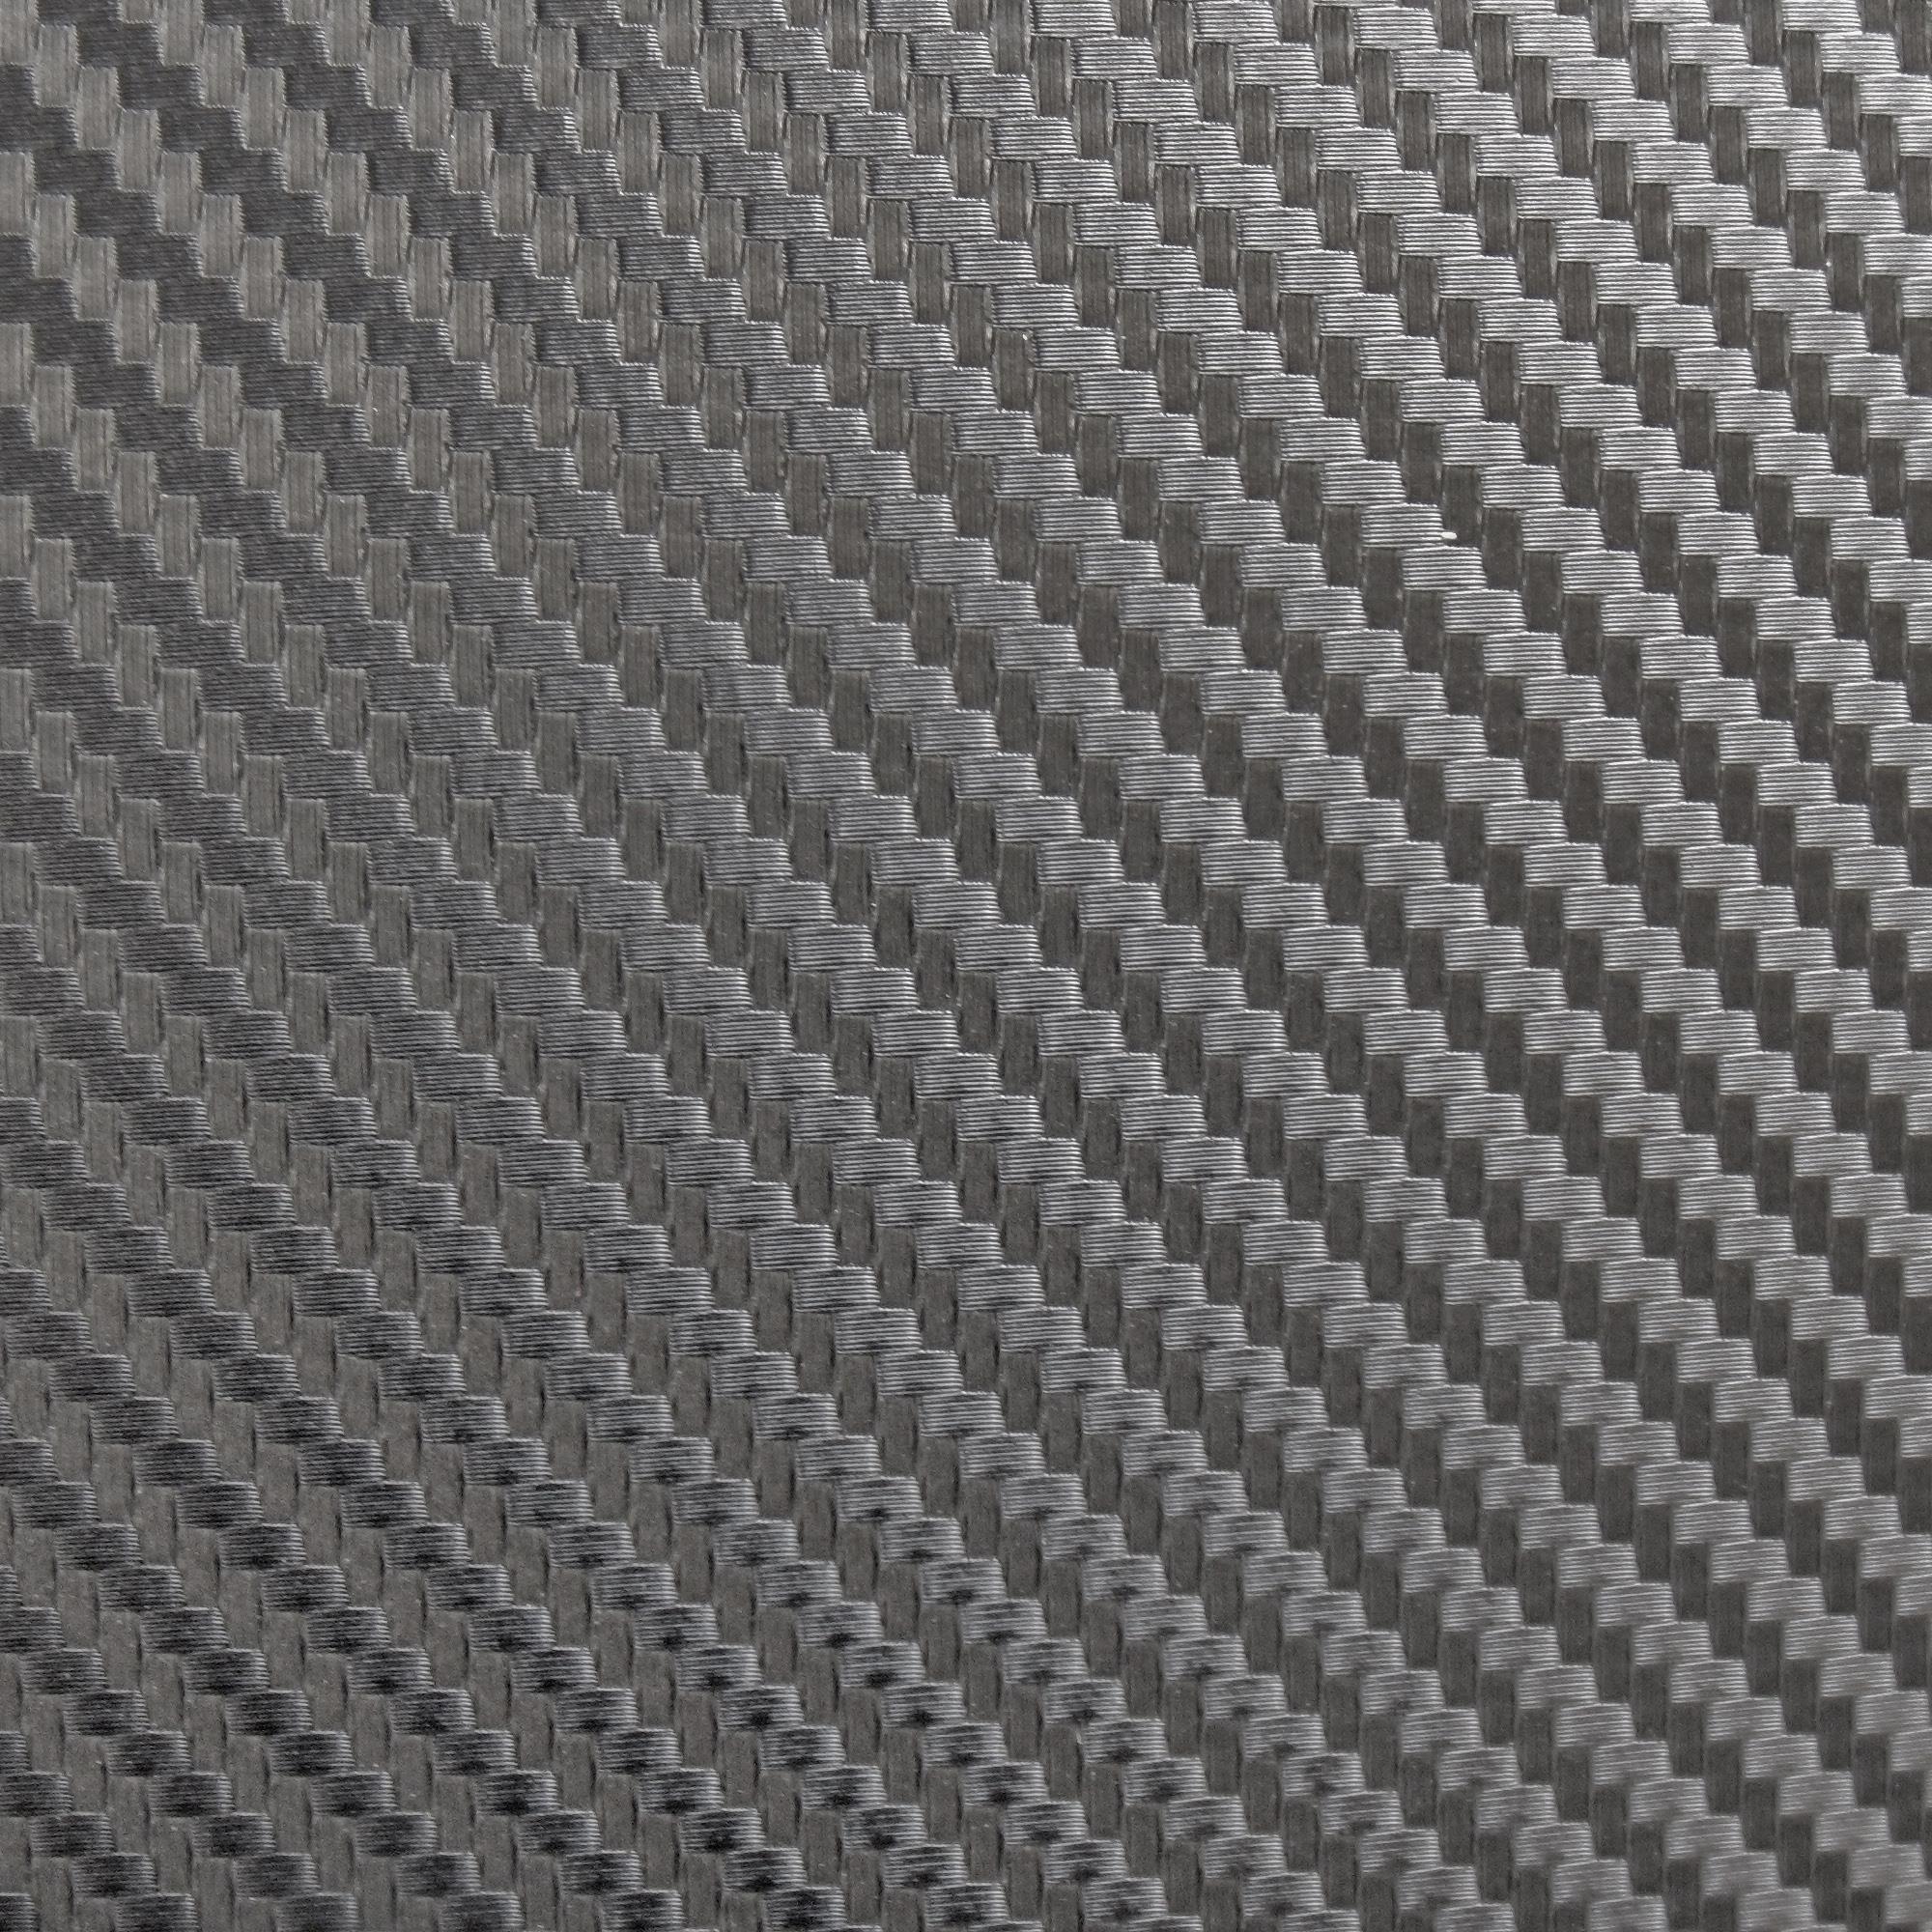 Carbon folie auto klebe struktur folie matt diamant for Graue klebefolie